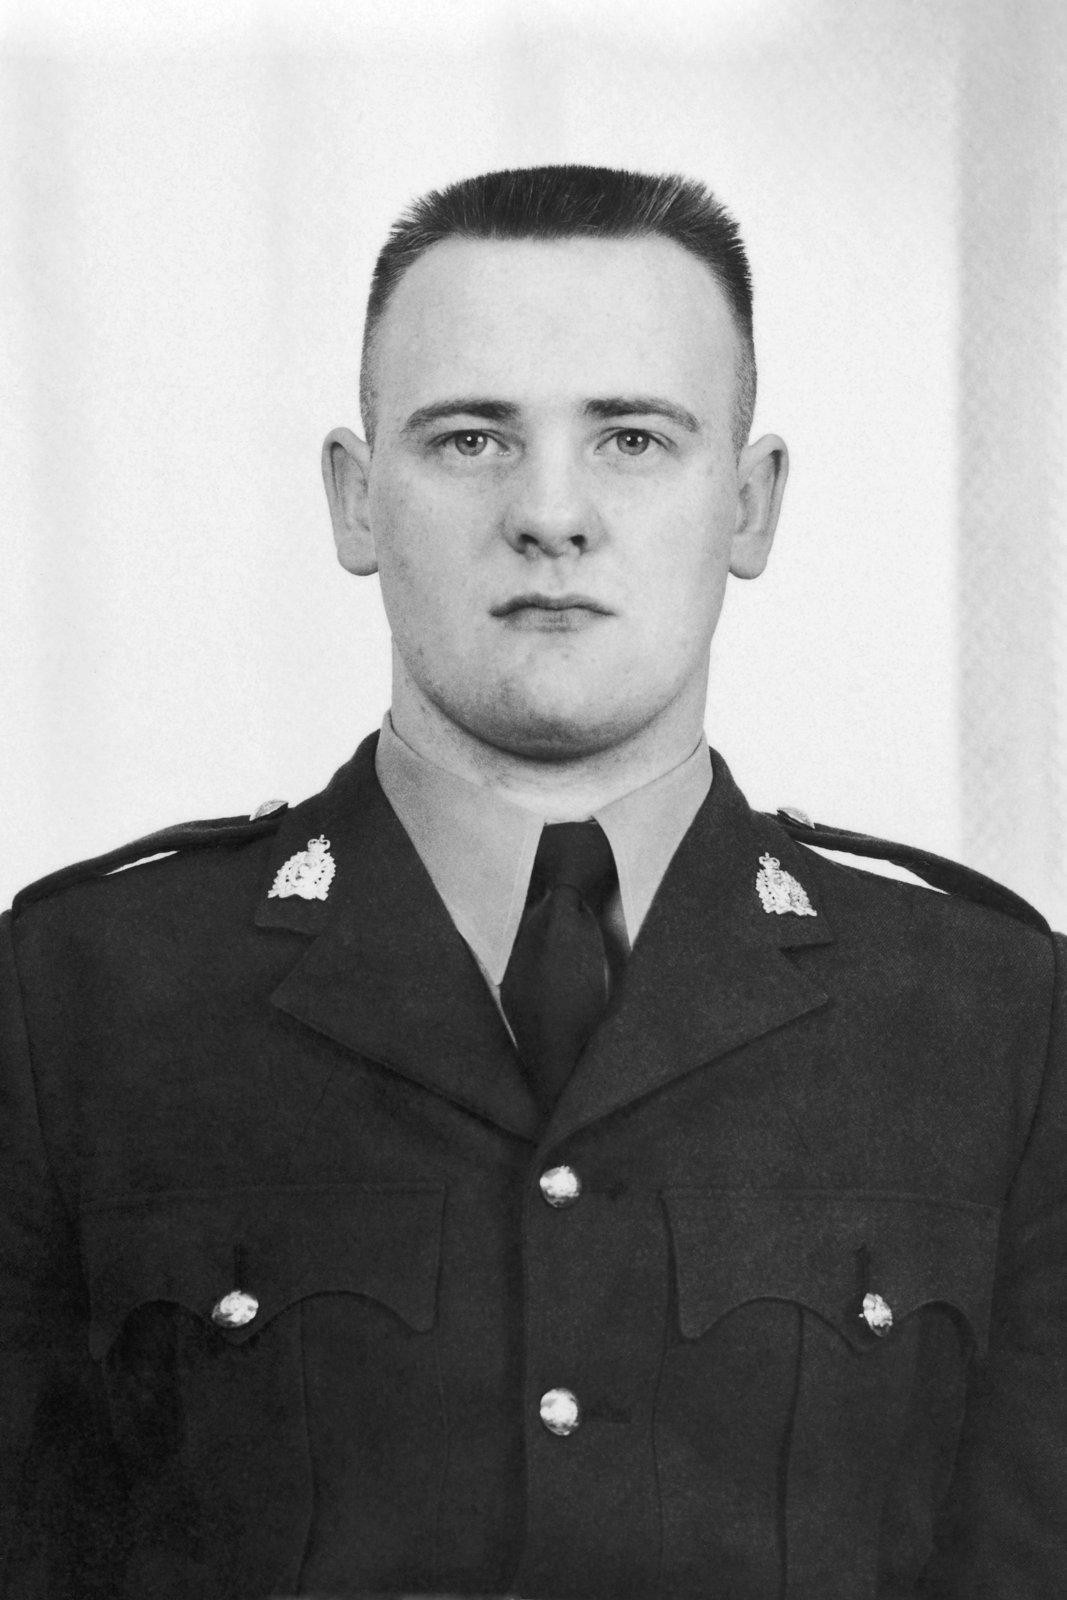 Gendarme Neil McArthur Bruce